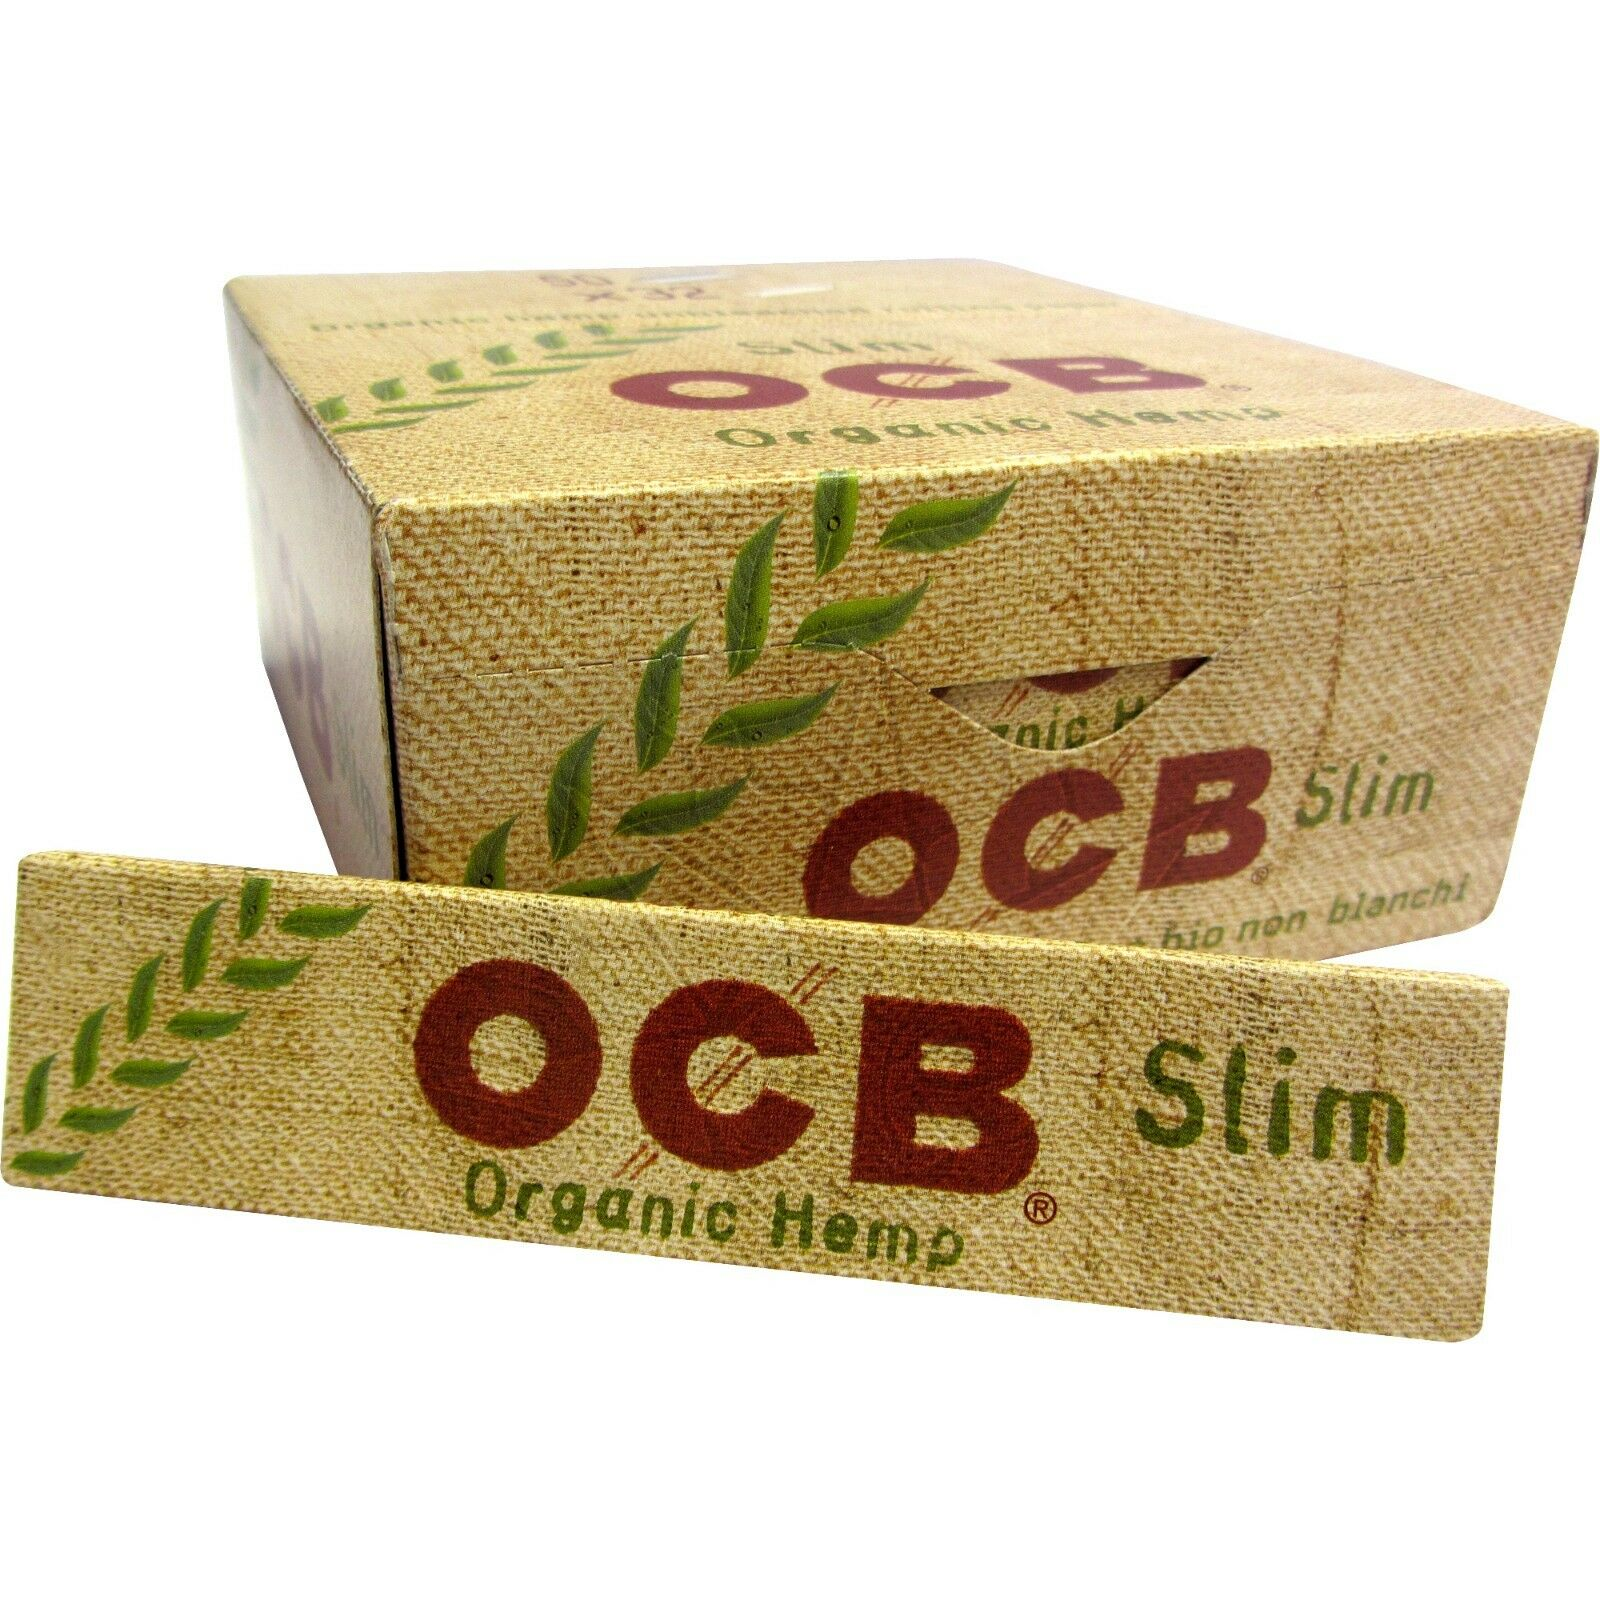 OCB Organic Hemp Slim Papers Blättchen Longpapes 50 x 32 ---Hier das Original---